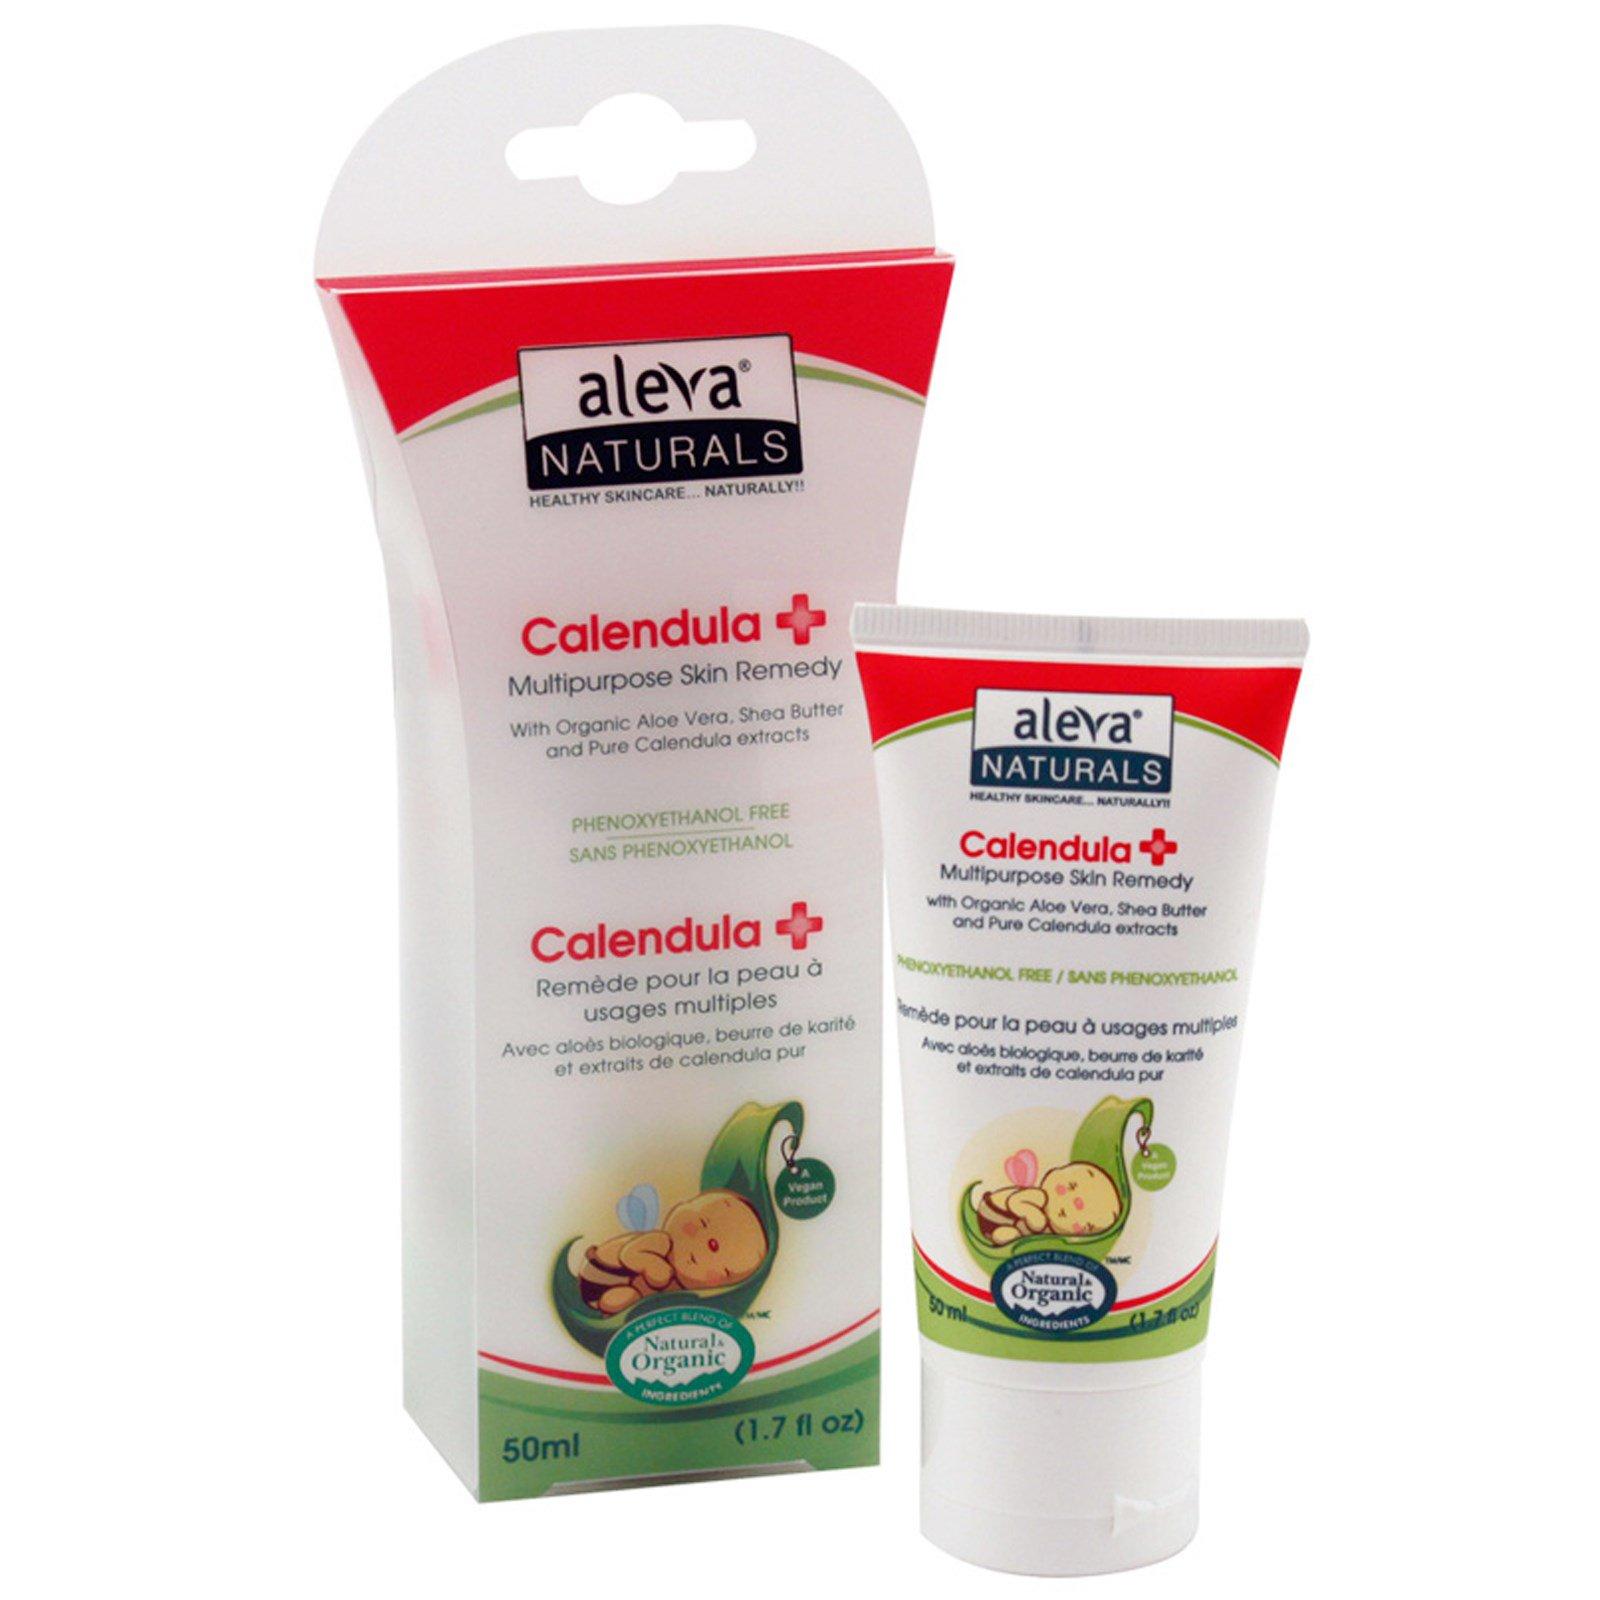 Image result for Aleva Natural calendula + multipurpose skin remedy 50ml